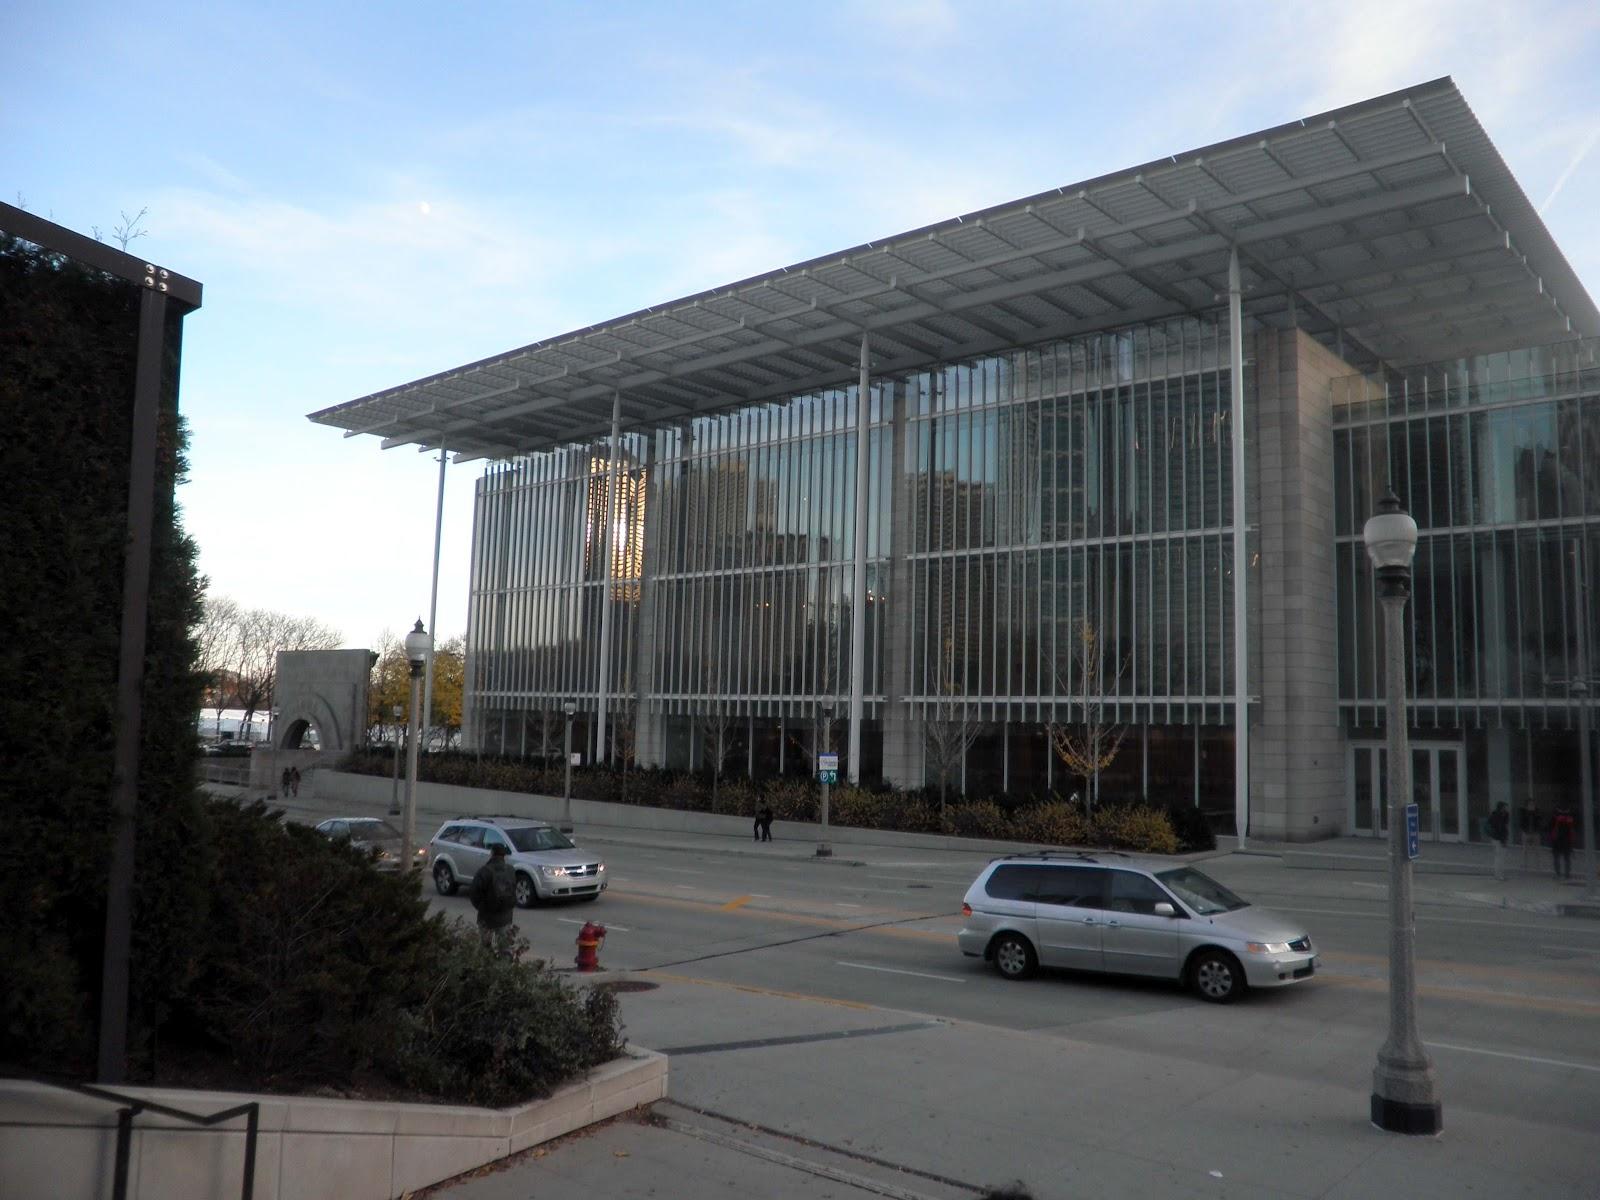 Art institute of chicago viaggi verde acido for Garage significato